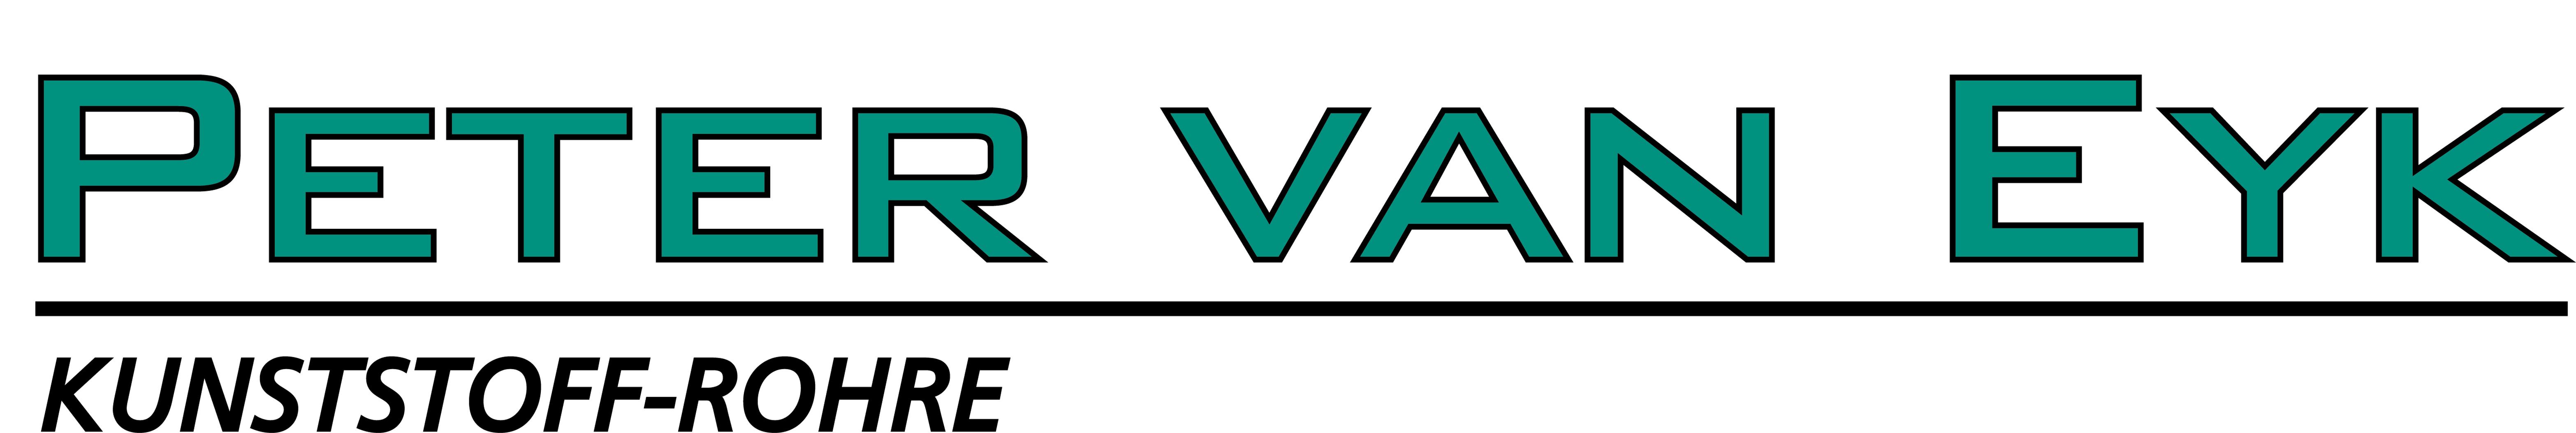 Peter van Eyk GmbH & Co. KG-Logo